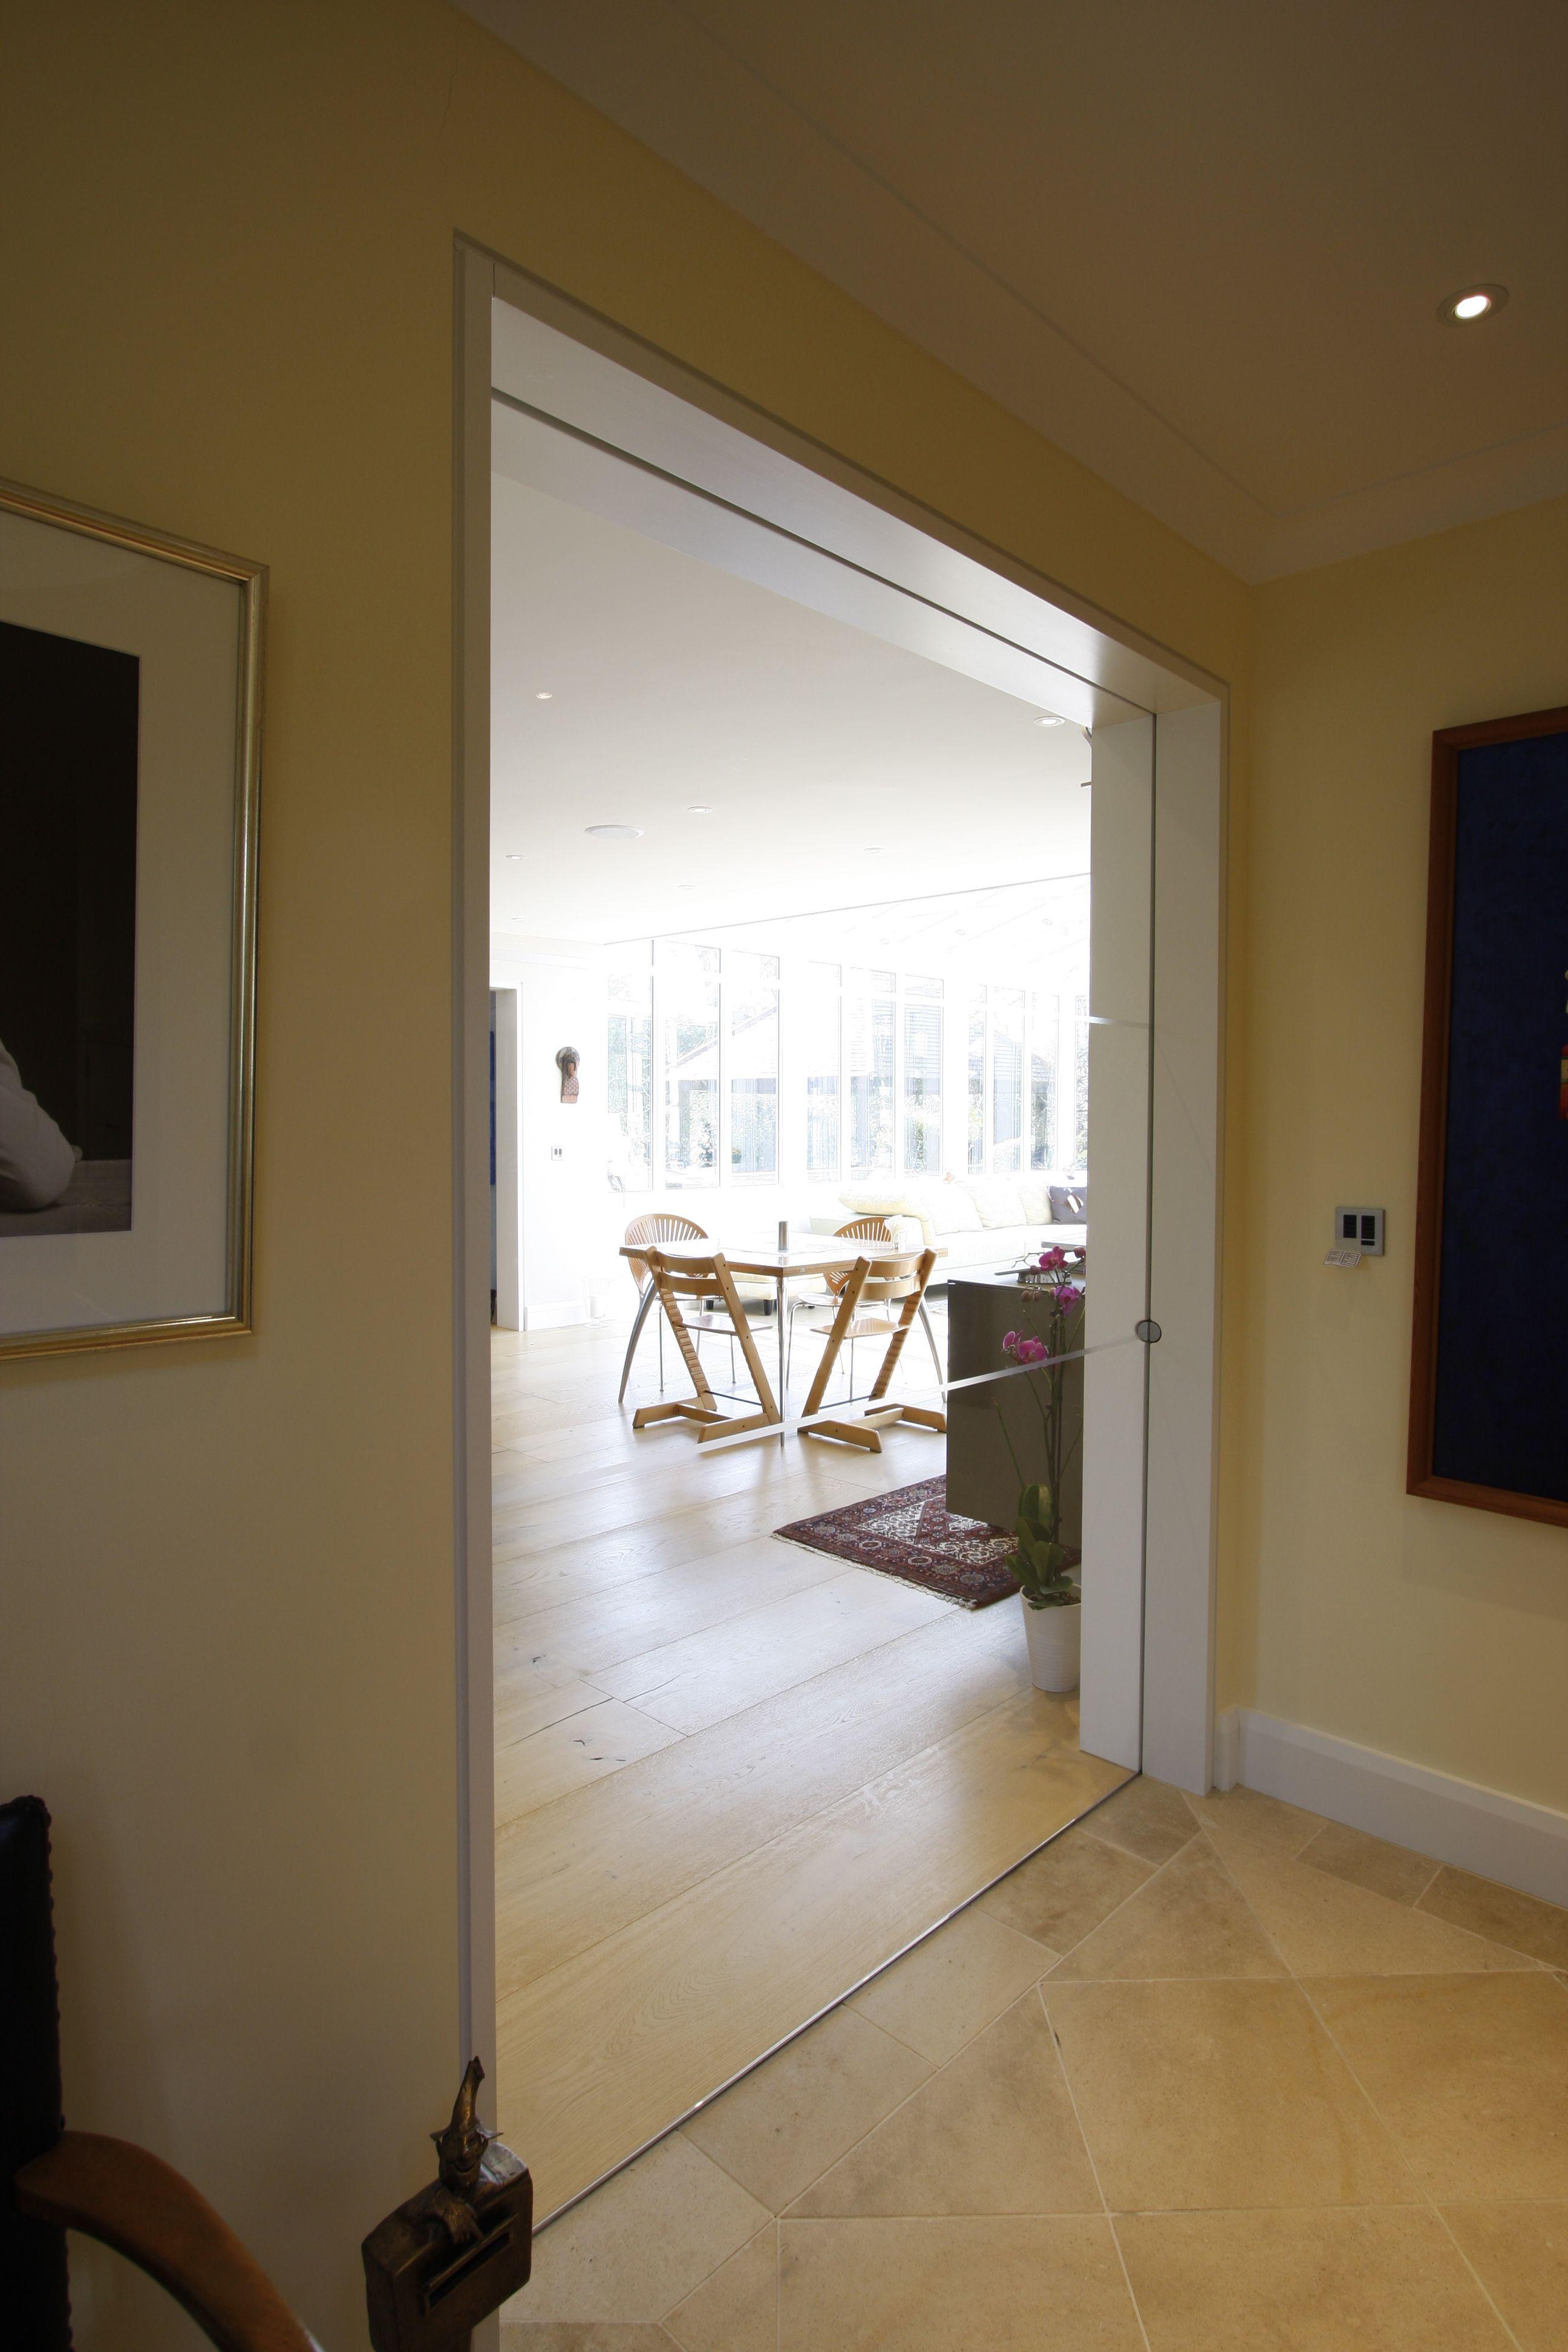 Sliding Door Into Wall internal single glazed, low iron frameless sliding door into